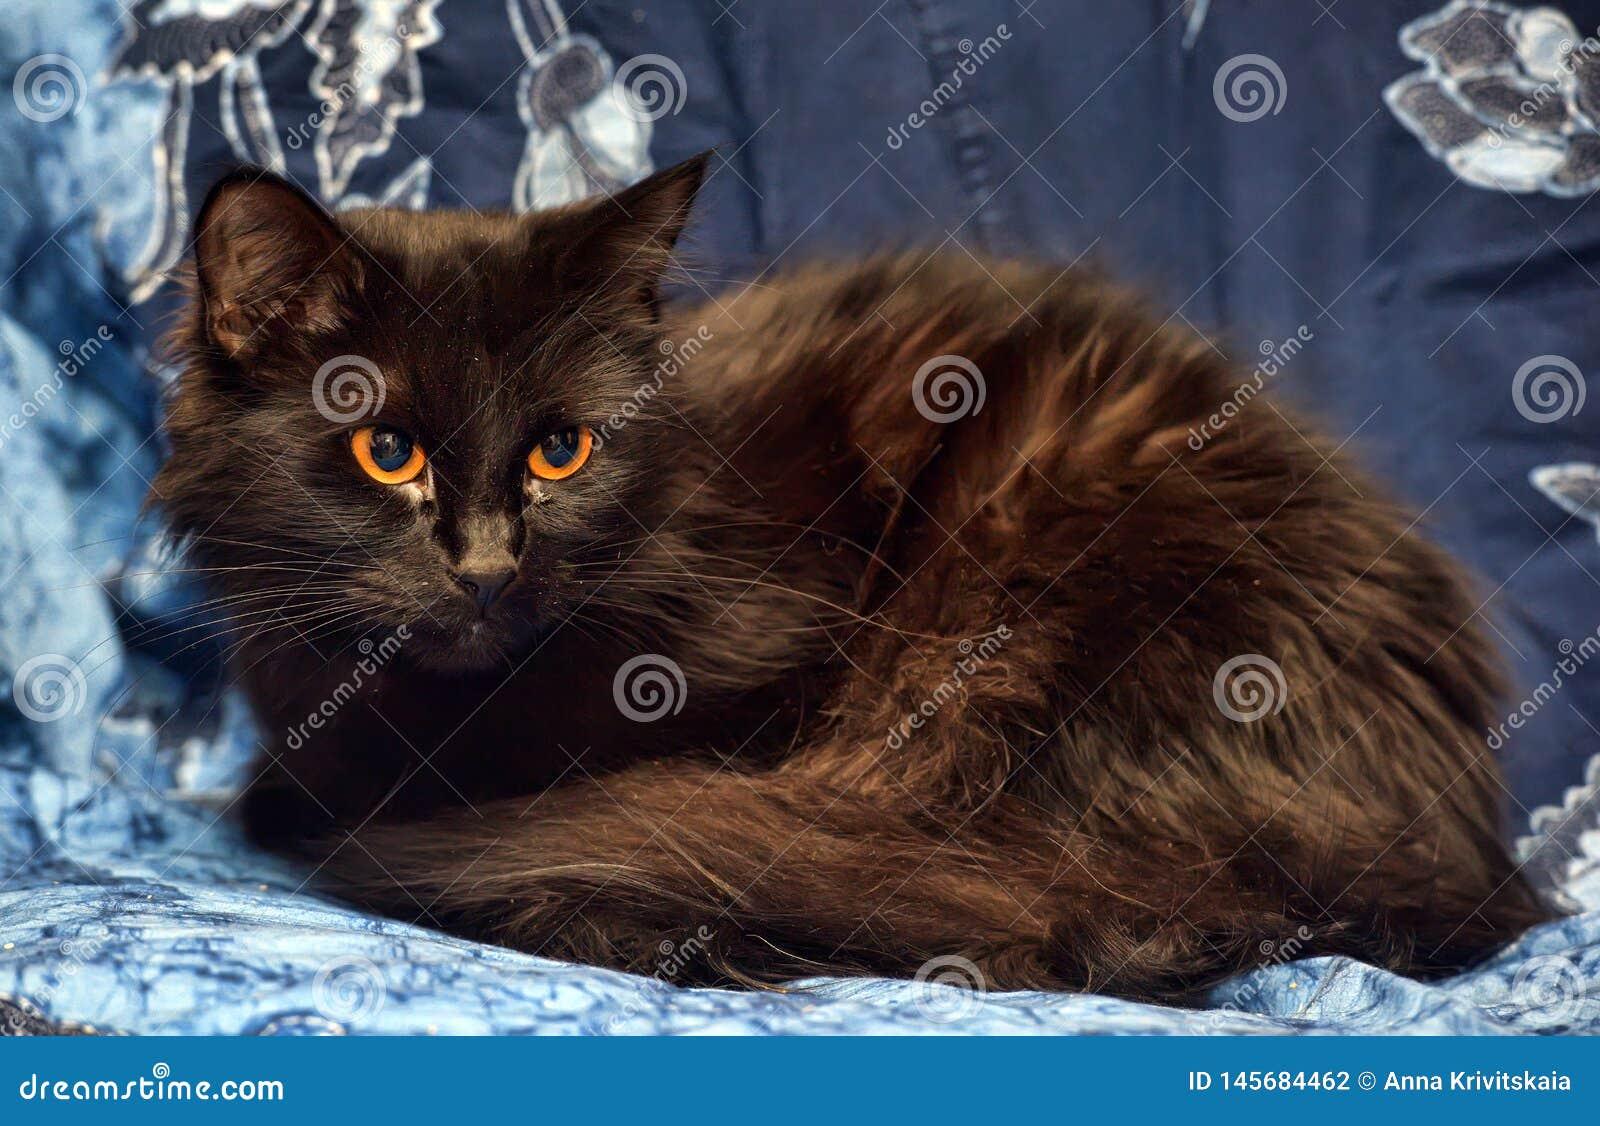 Gato macio preto com olhos amarelos